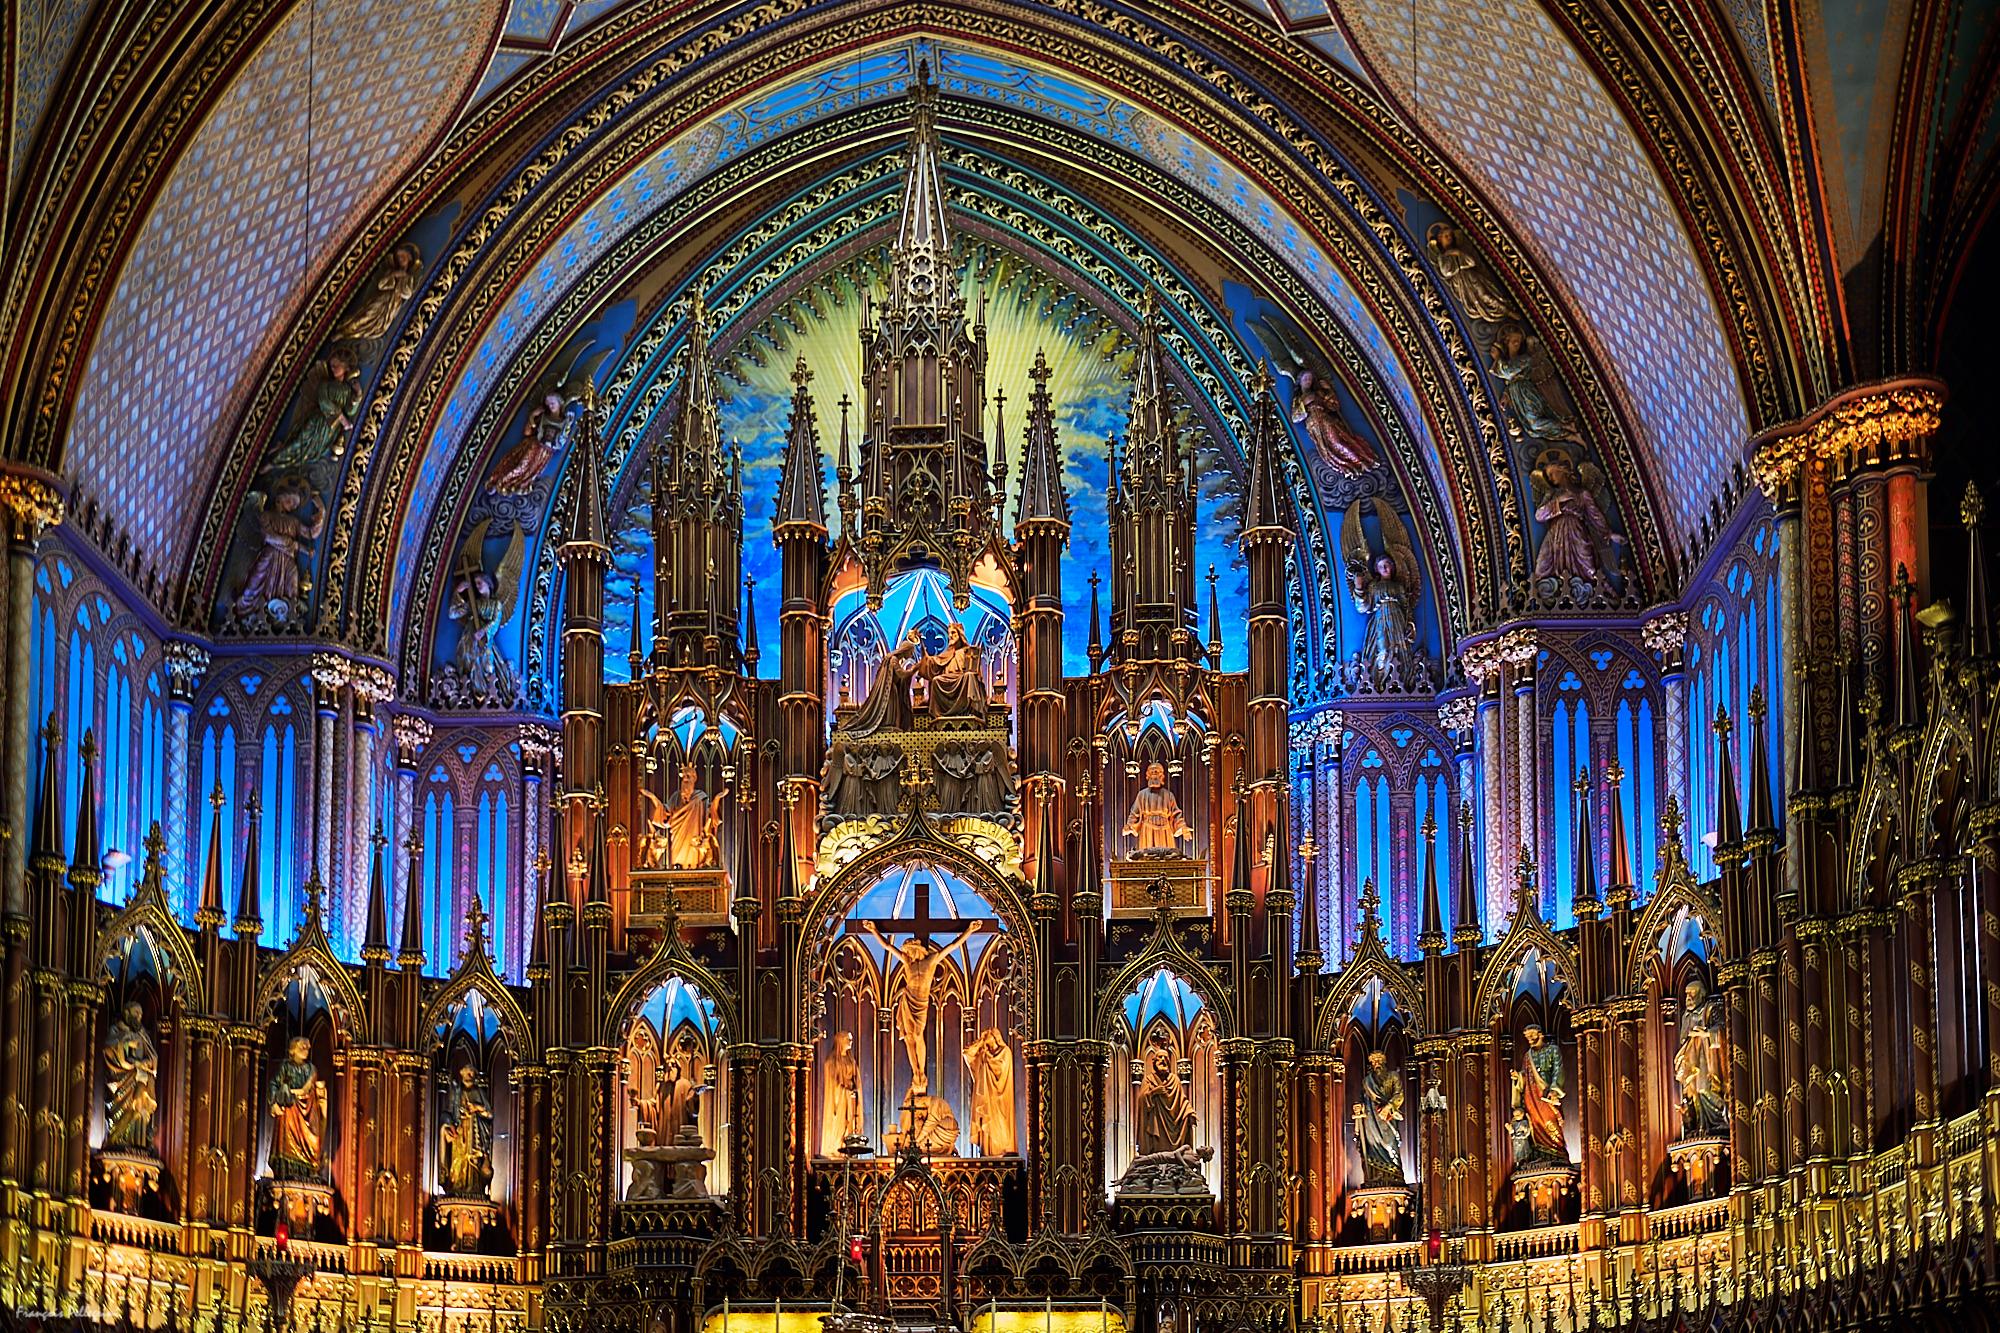 Basilique Notre-Dame (Indoors), Montreal, Canada